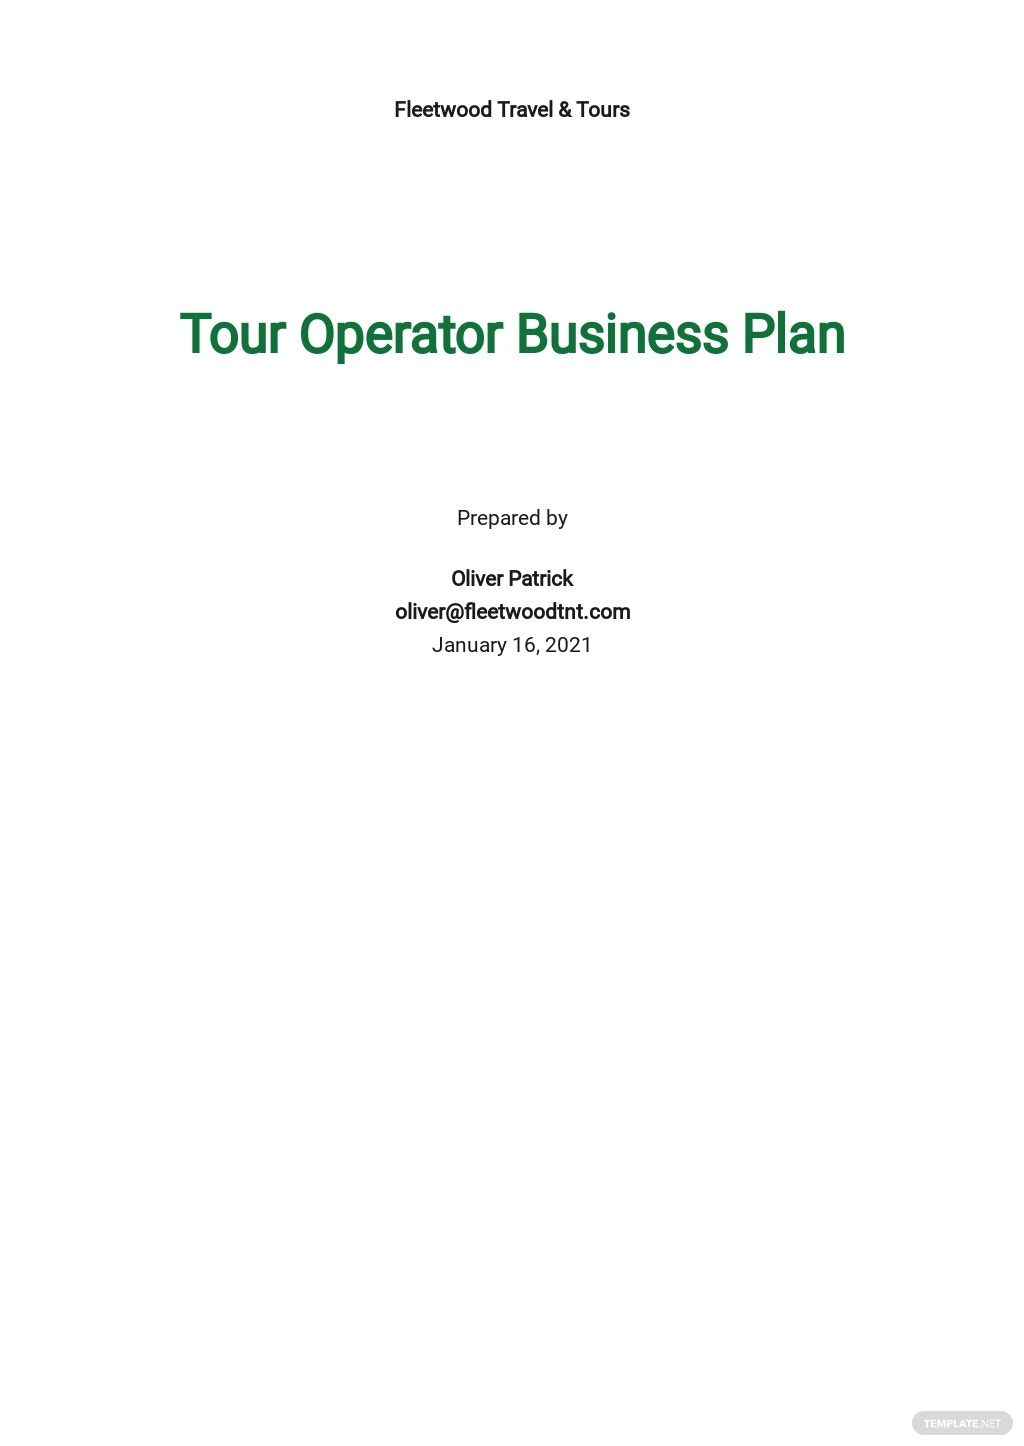 Tour Operator Business Plan Template.jpe